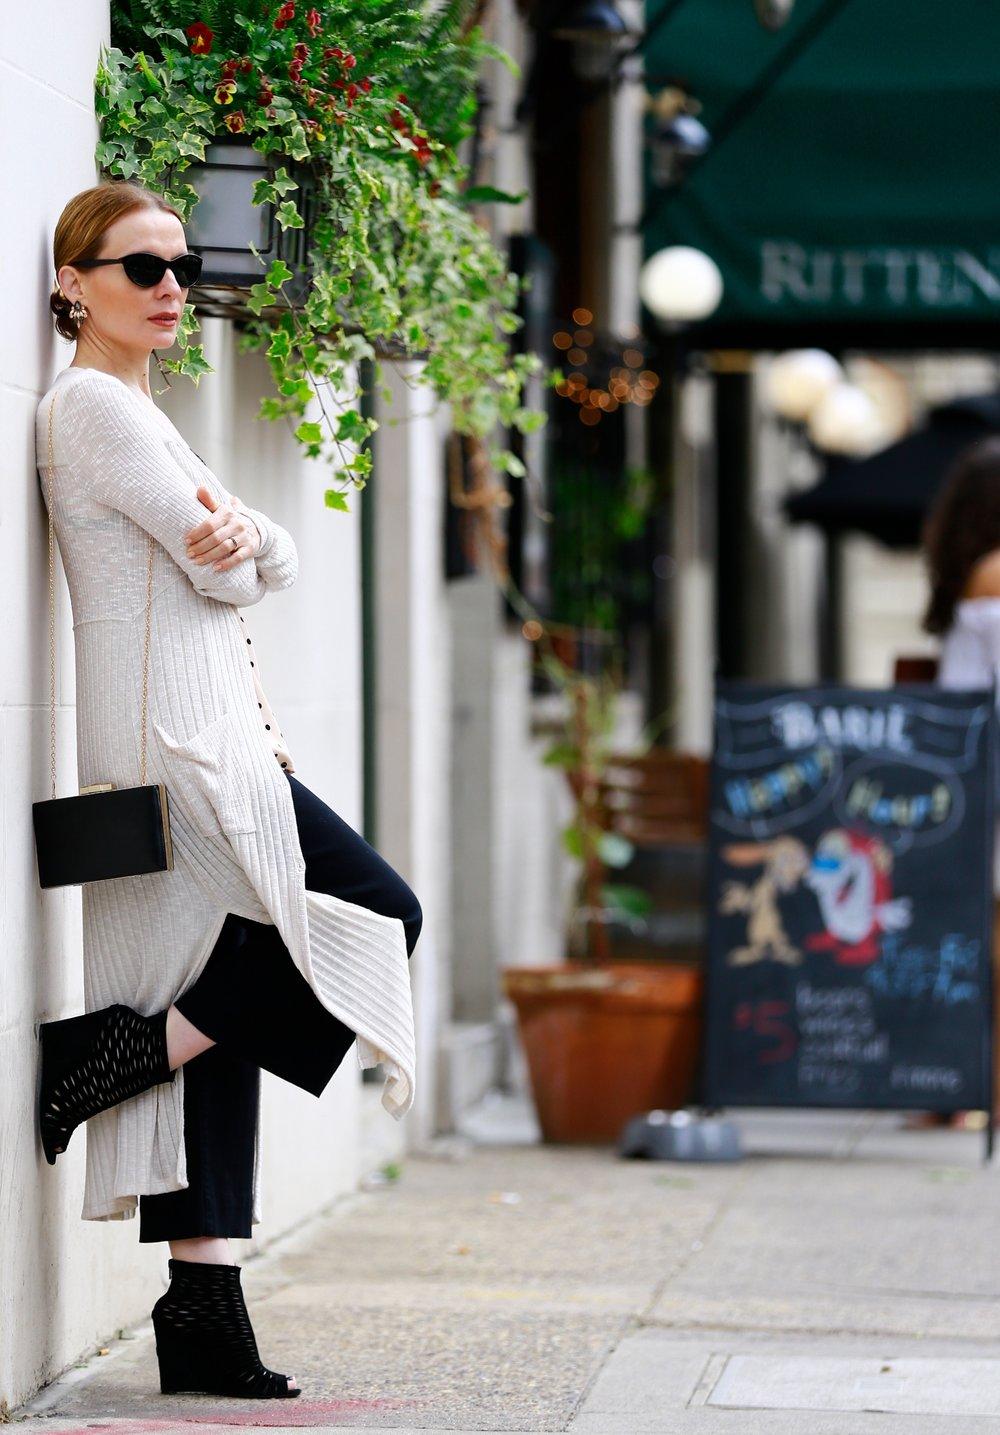 Women's Fashion Inspiration,Summer Fashion Blog,Summer Fashion Inspiration,Women's Summer Style,July Fashion,Russian Fashion Blogger,Tatiana Moskatova 5